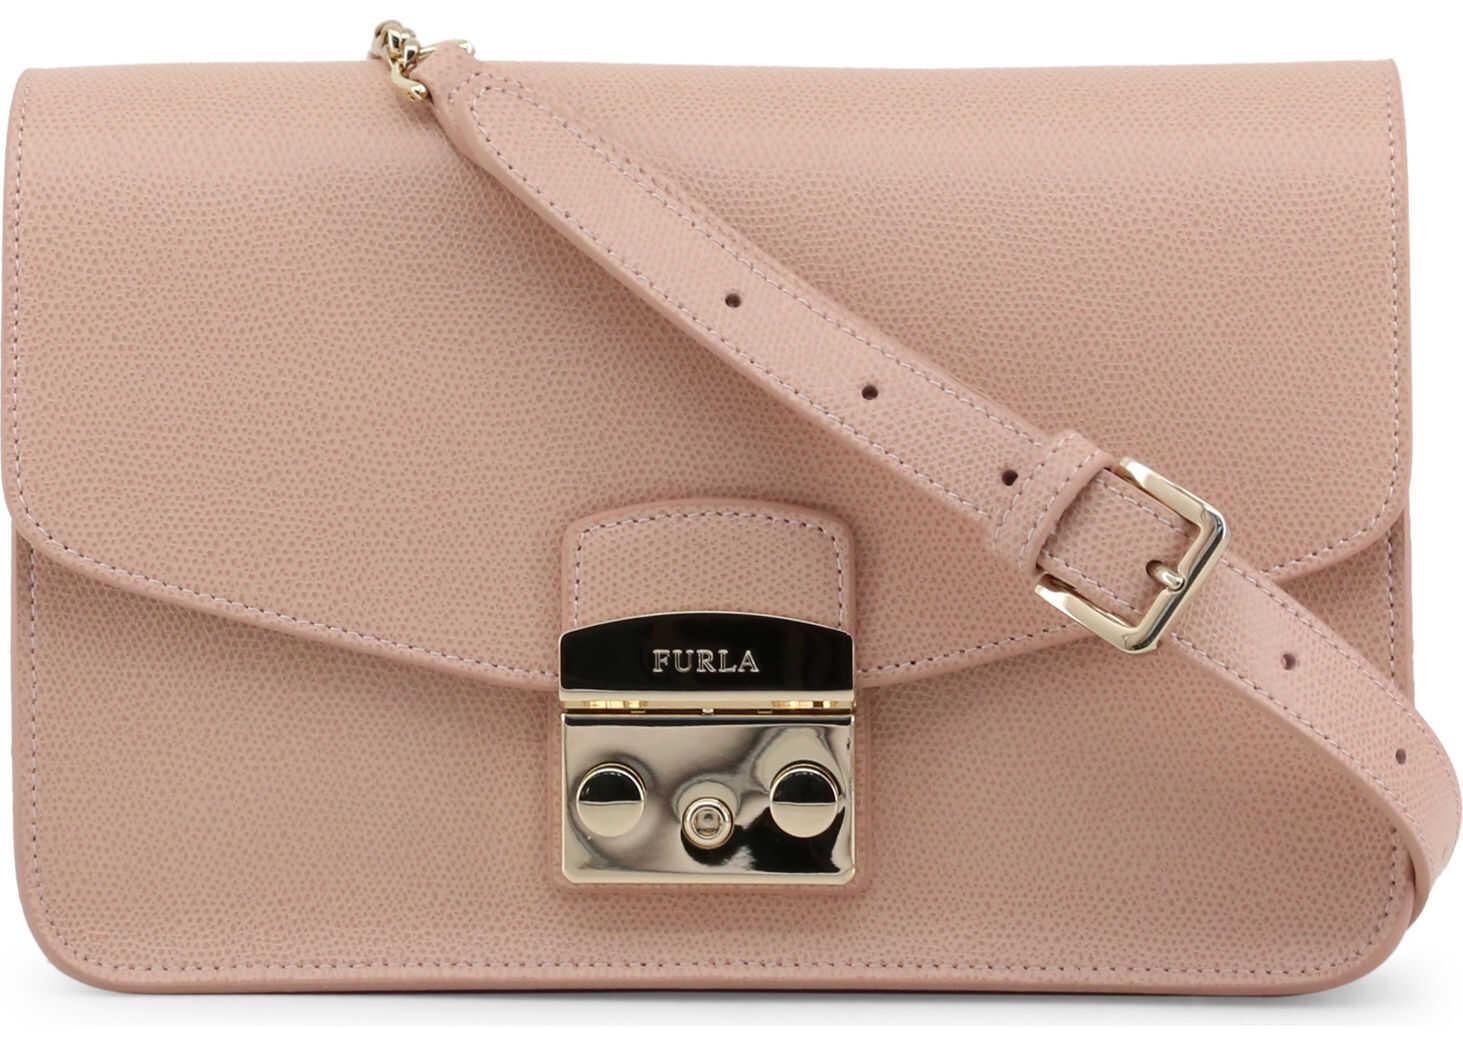 Furla 972388 Pink